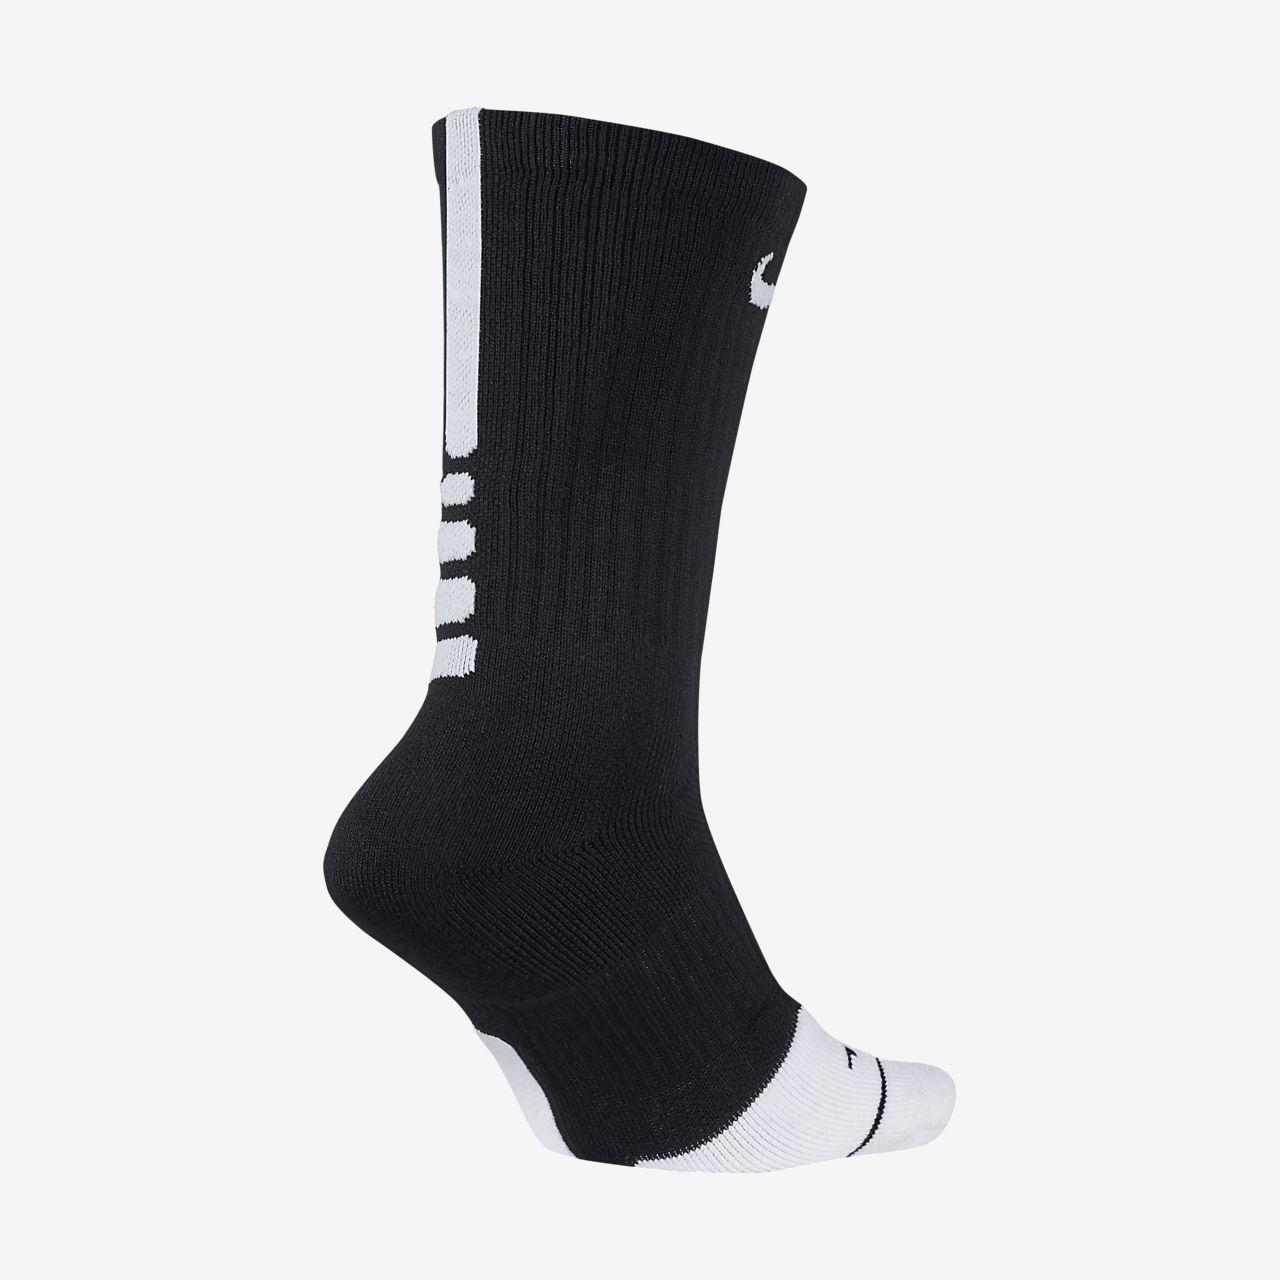 Basketstrumpor Nike Dry Elite 1.5 Crew